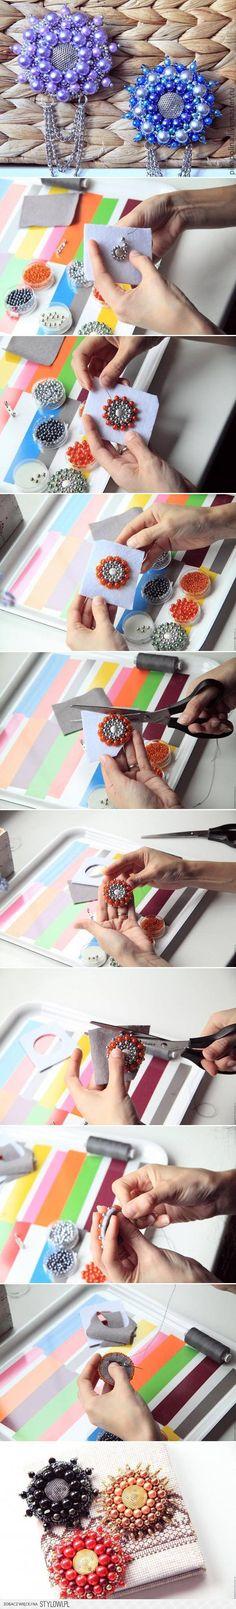 DIY Beads Flower Brooch DIY Projects | UsefulDIY.com